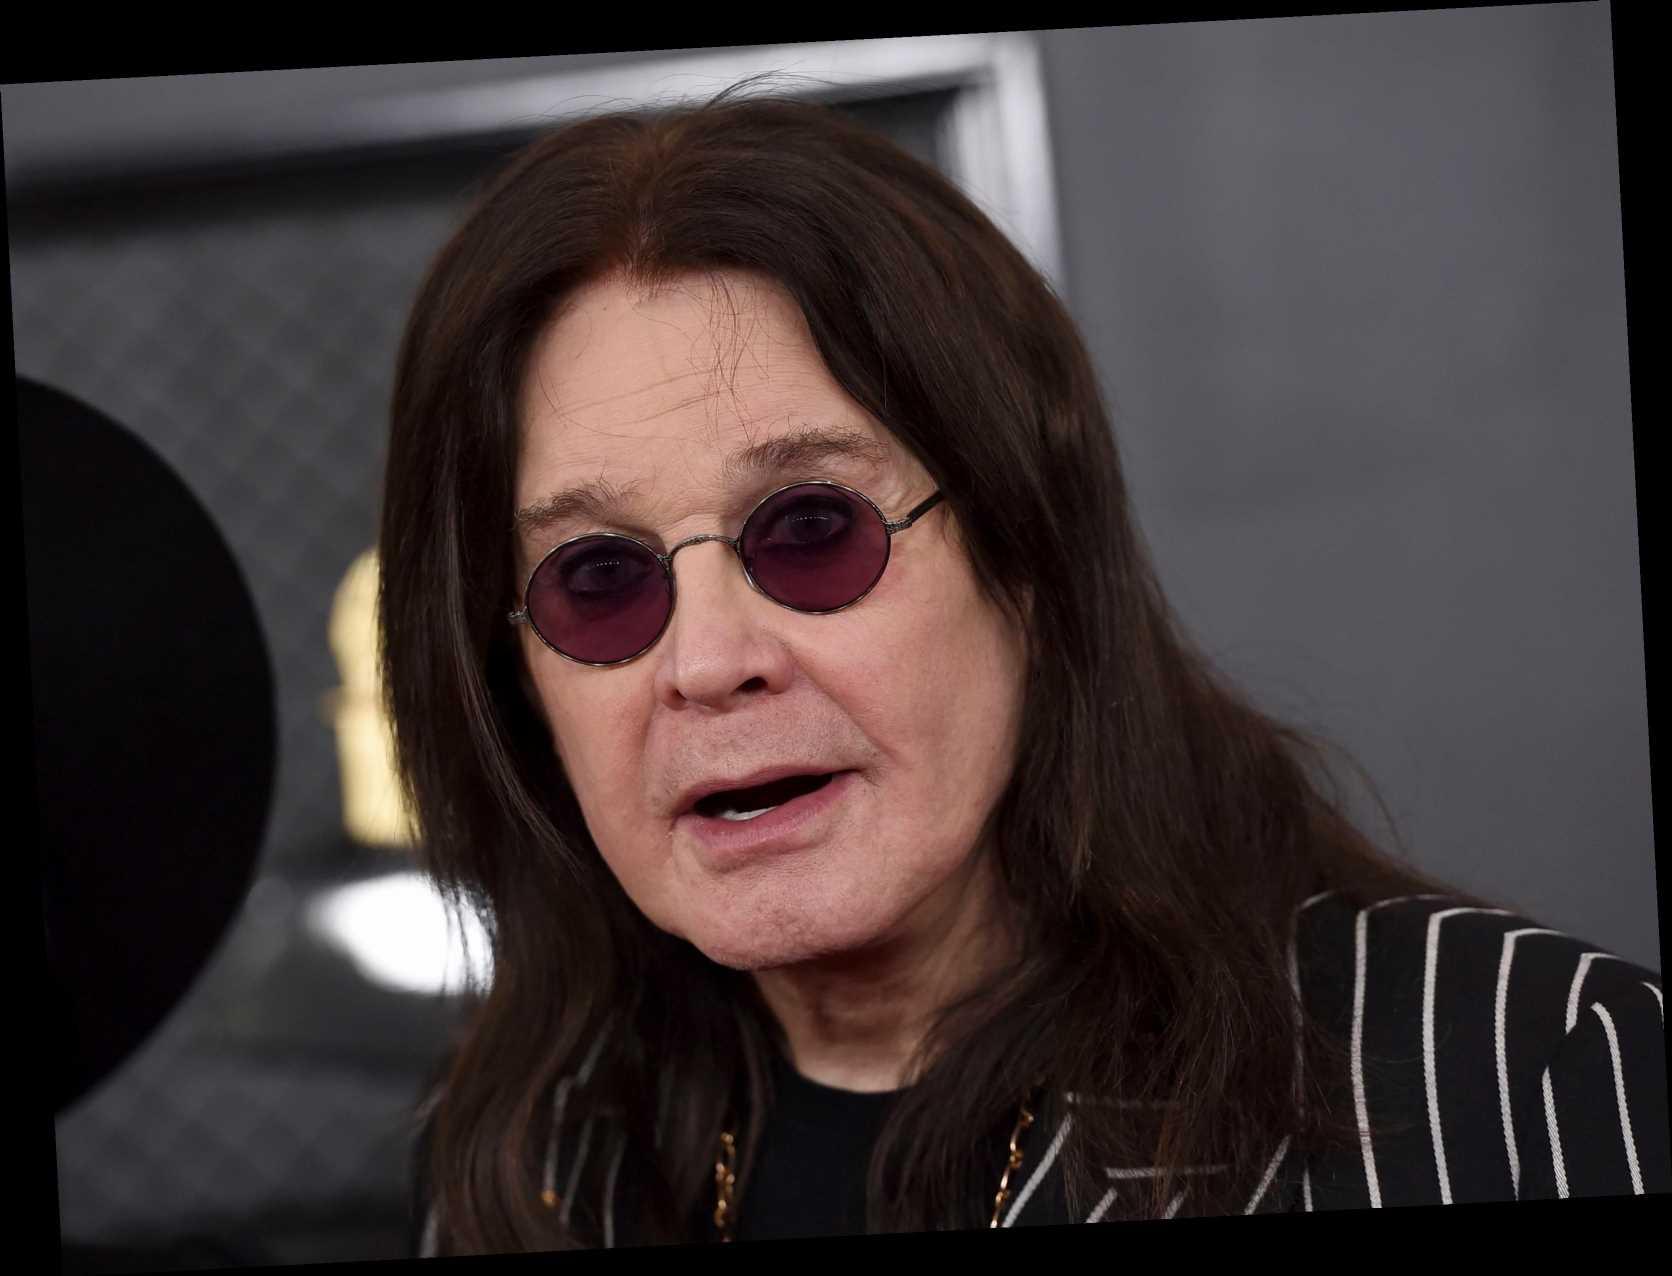 Ozzy Osbourne Cancels SXSW Appearances Amid Coronavirus Concerns